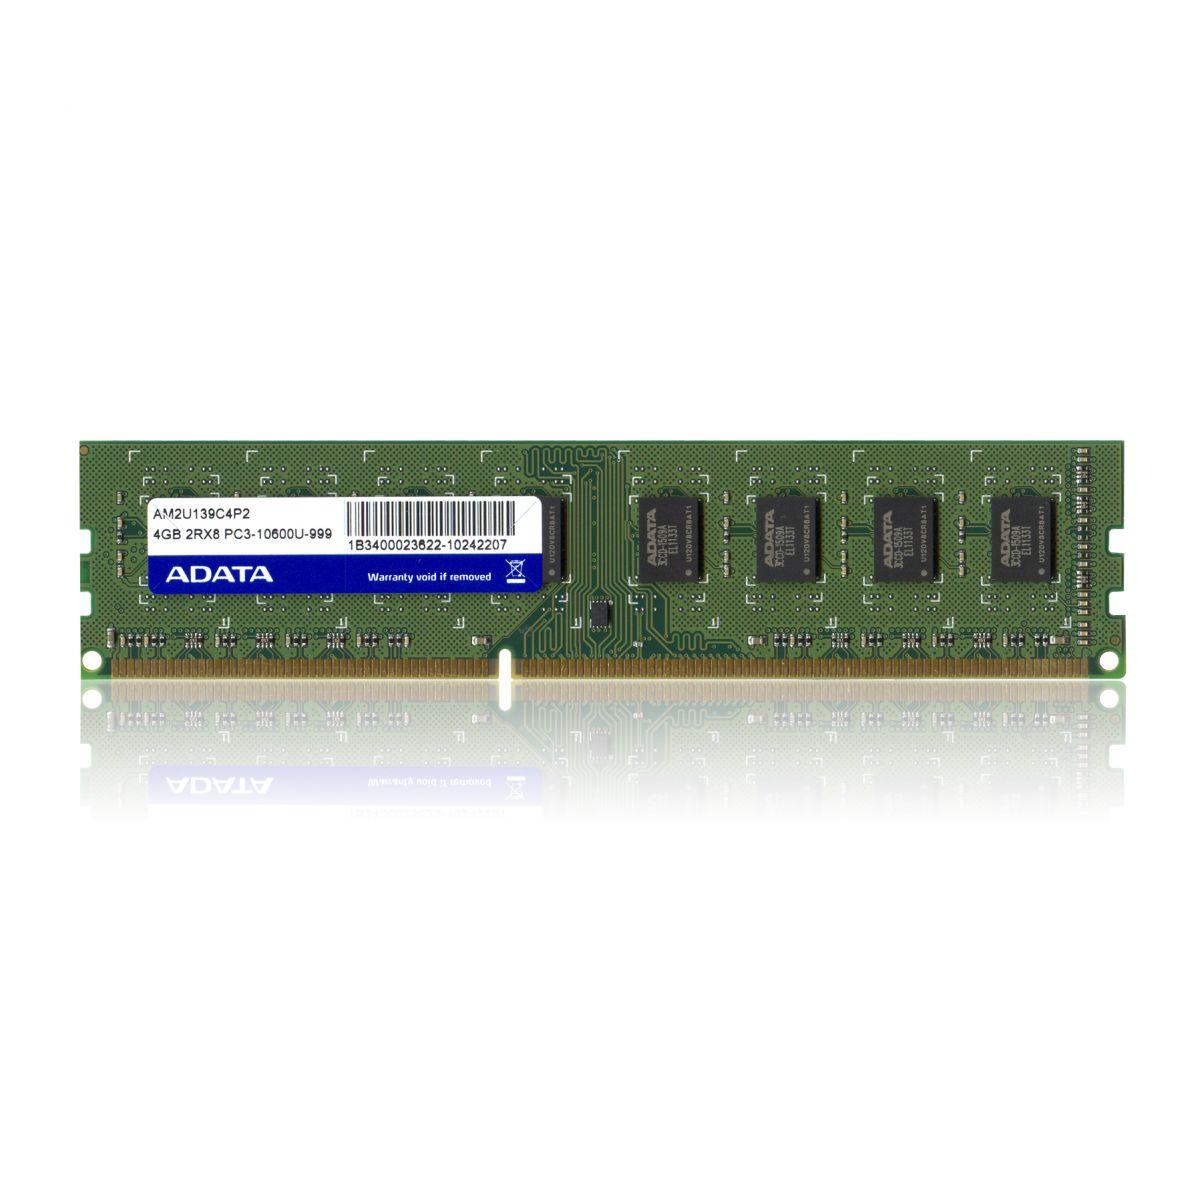 ADATA Premier Pro DDR3-1333 4GB